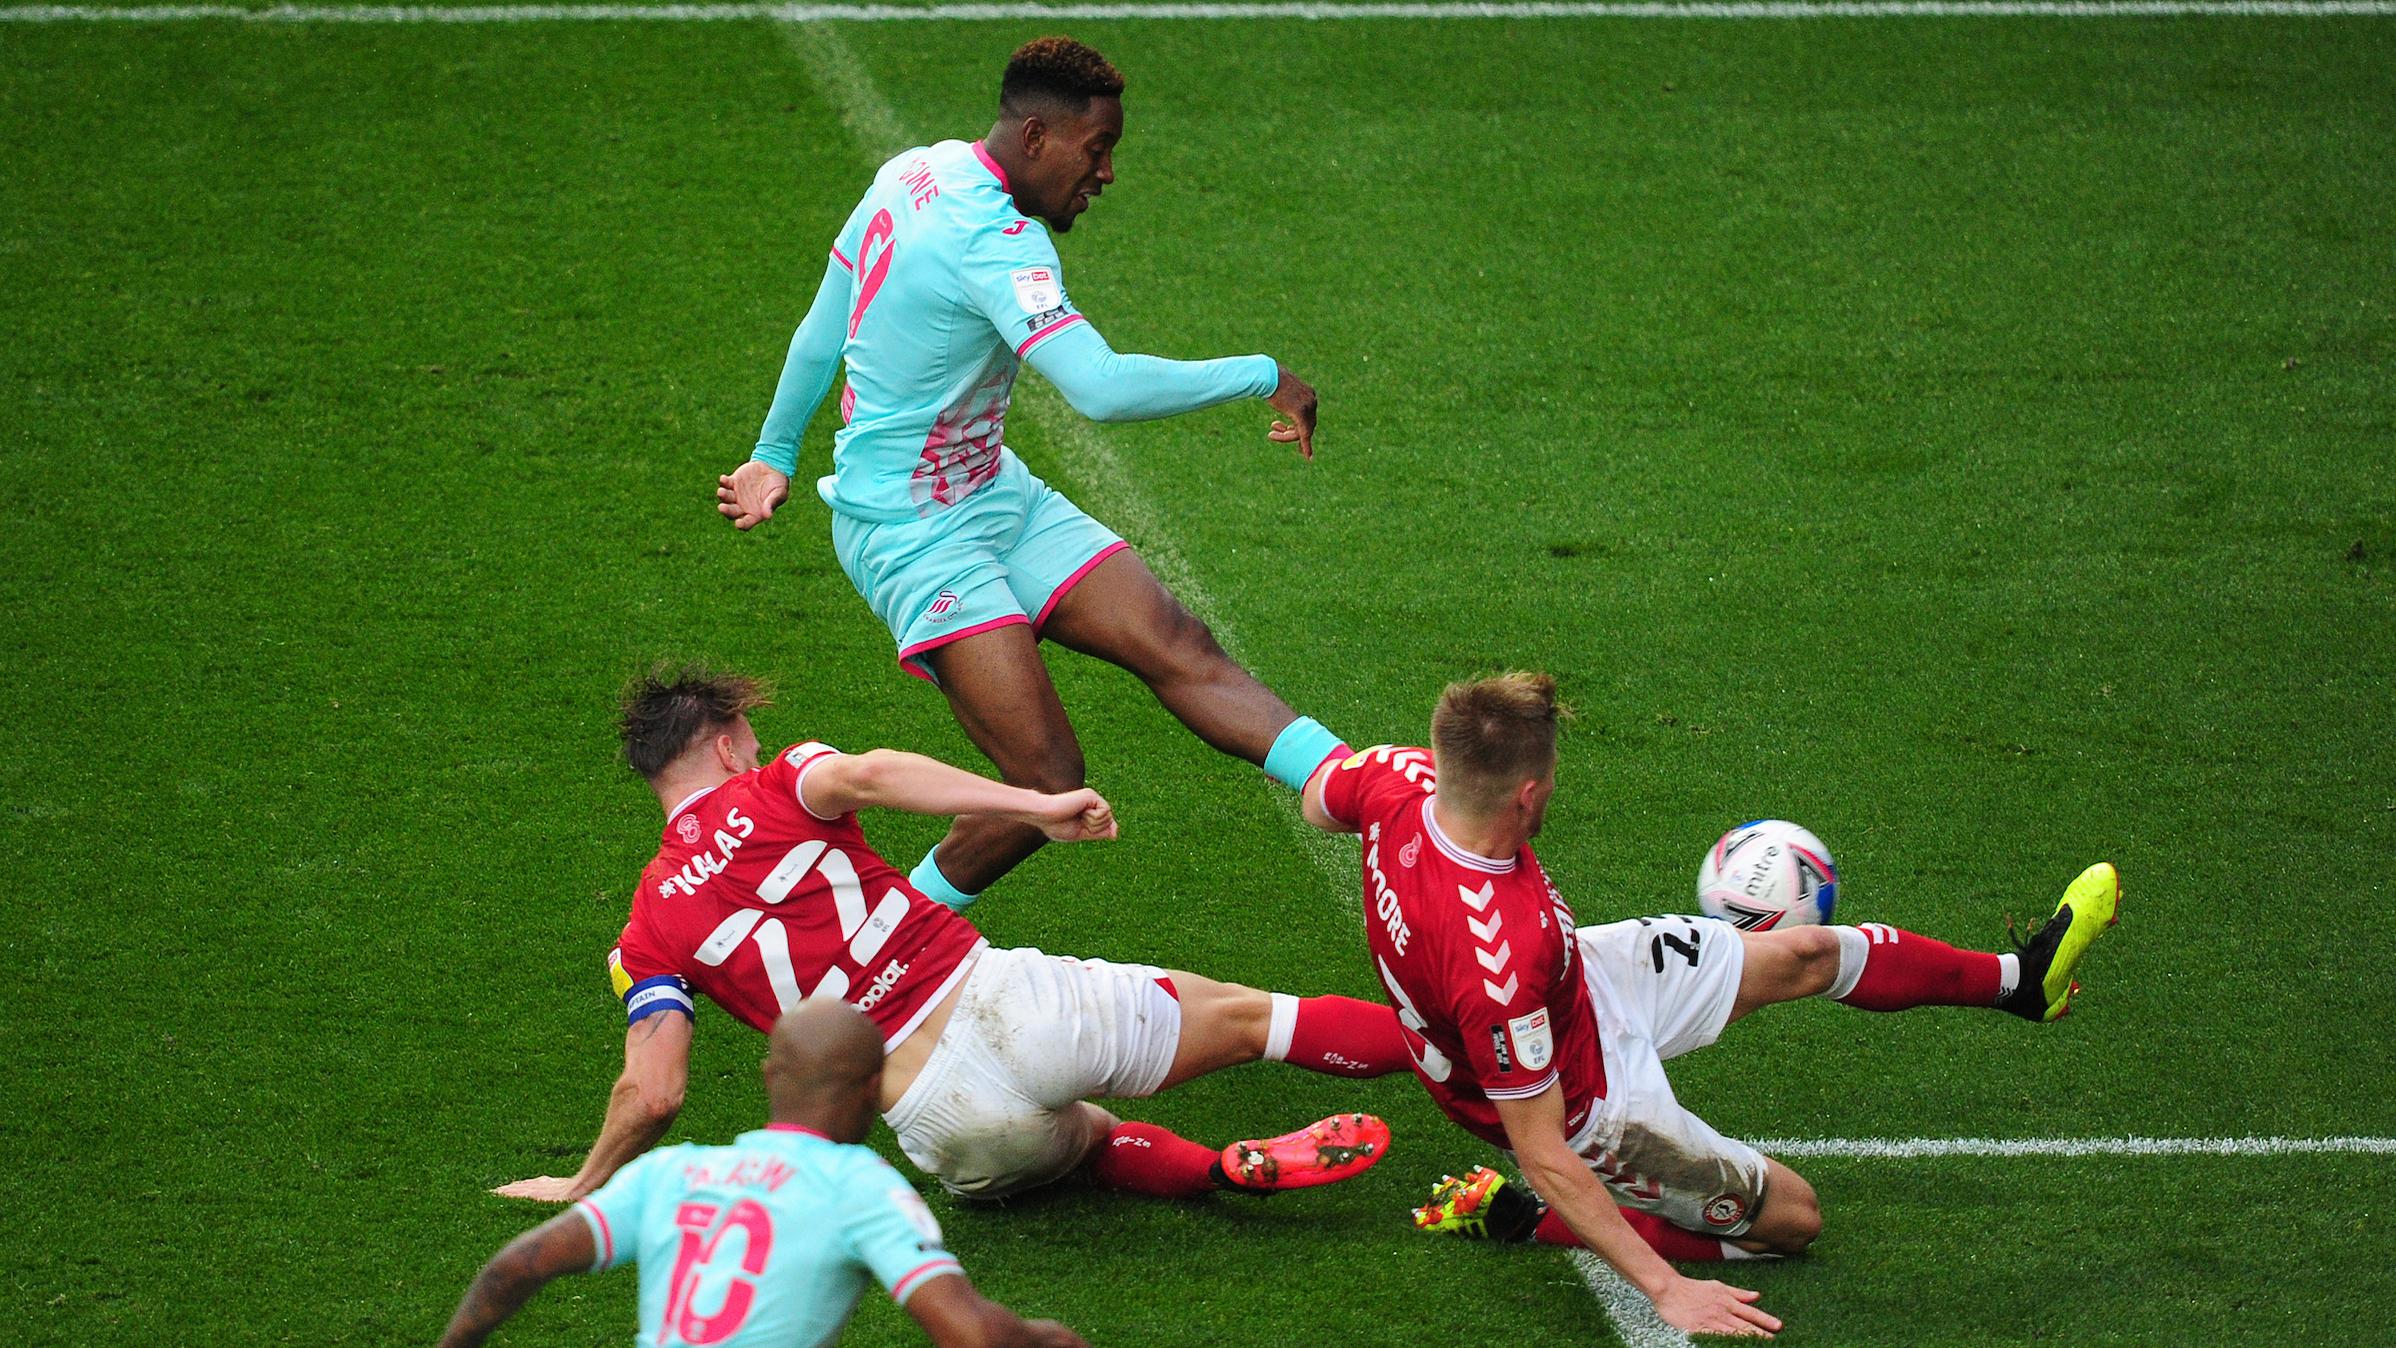 Report | Bristol City 1 Swansea City 1 | Swansea